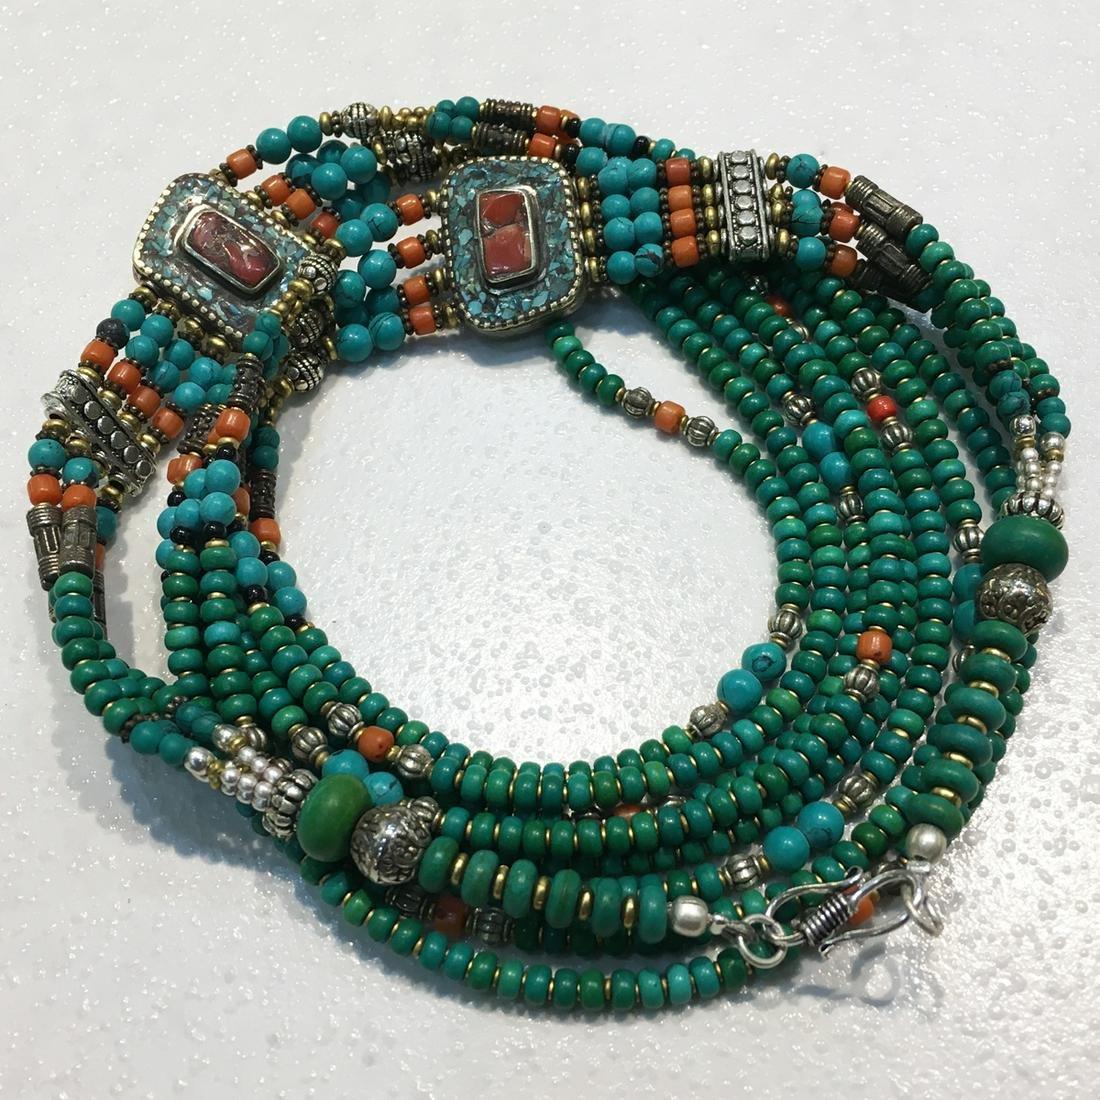 Tibetan Natural Turquoise Antique Handmade Necklace